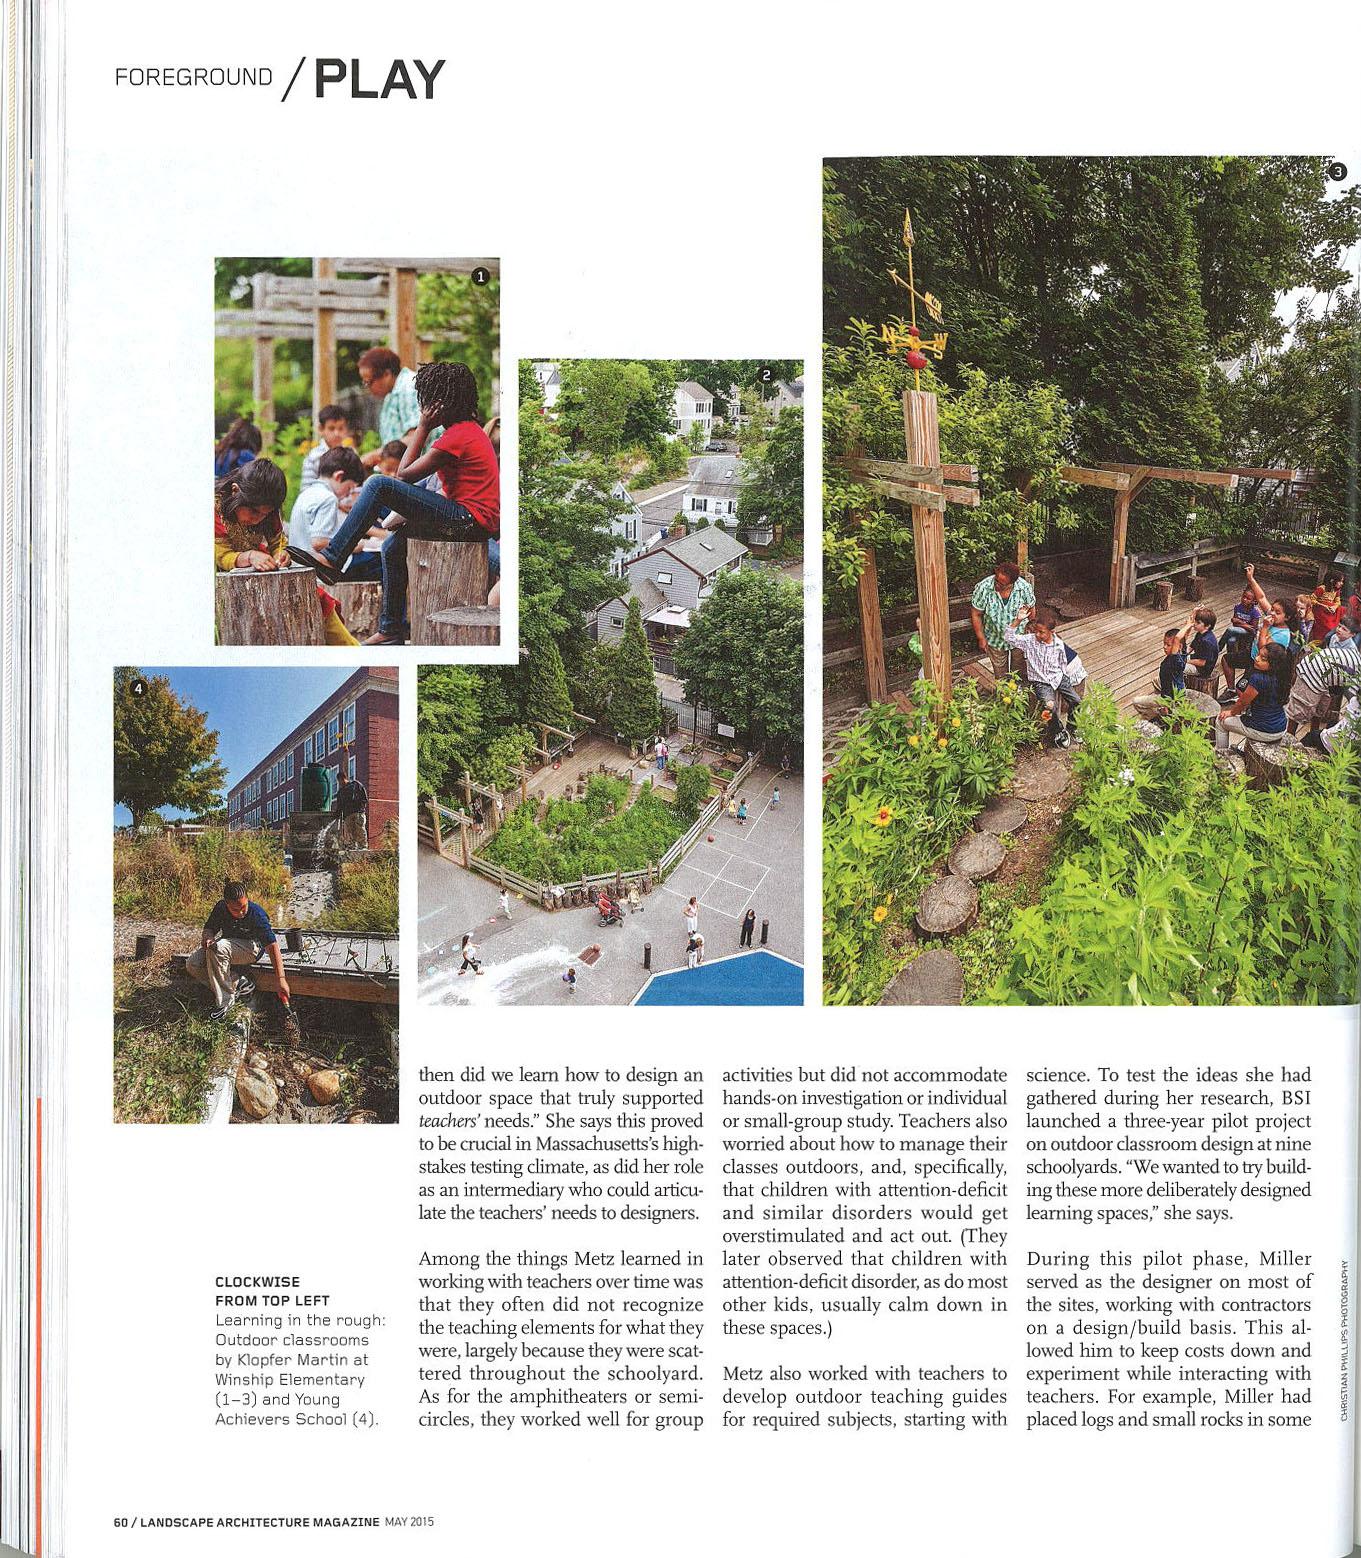 60 klopfer martin landscape architecture magazine.jpg